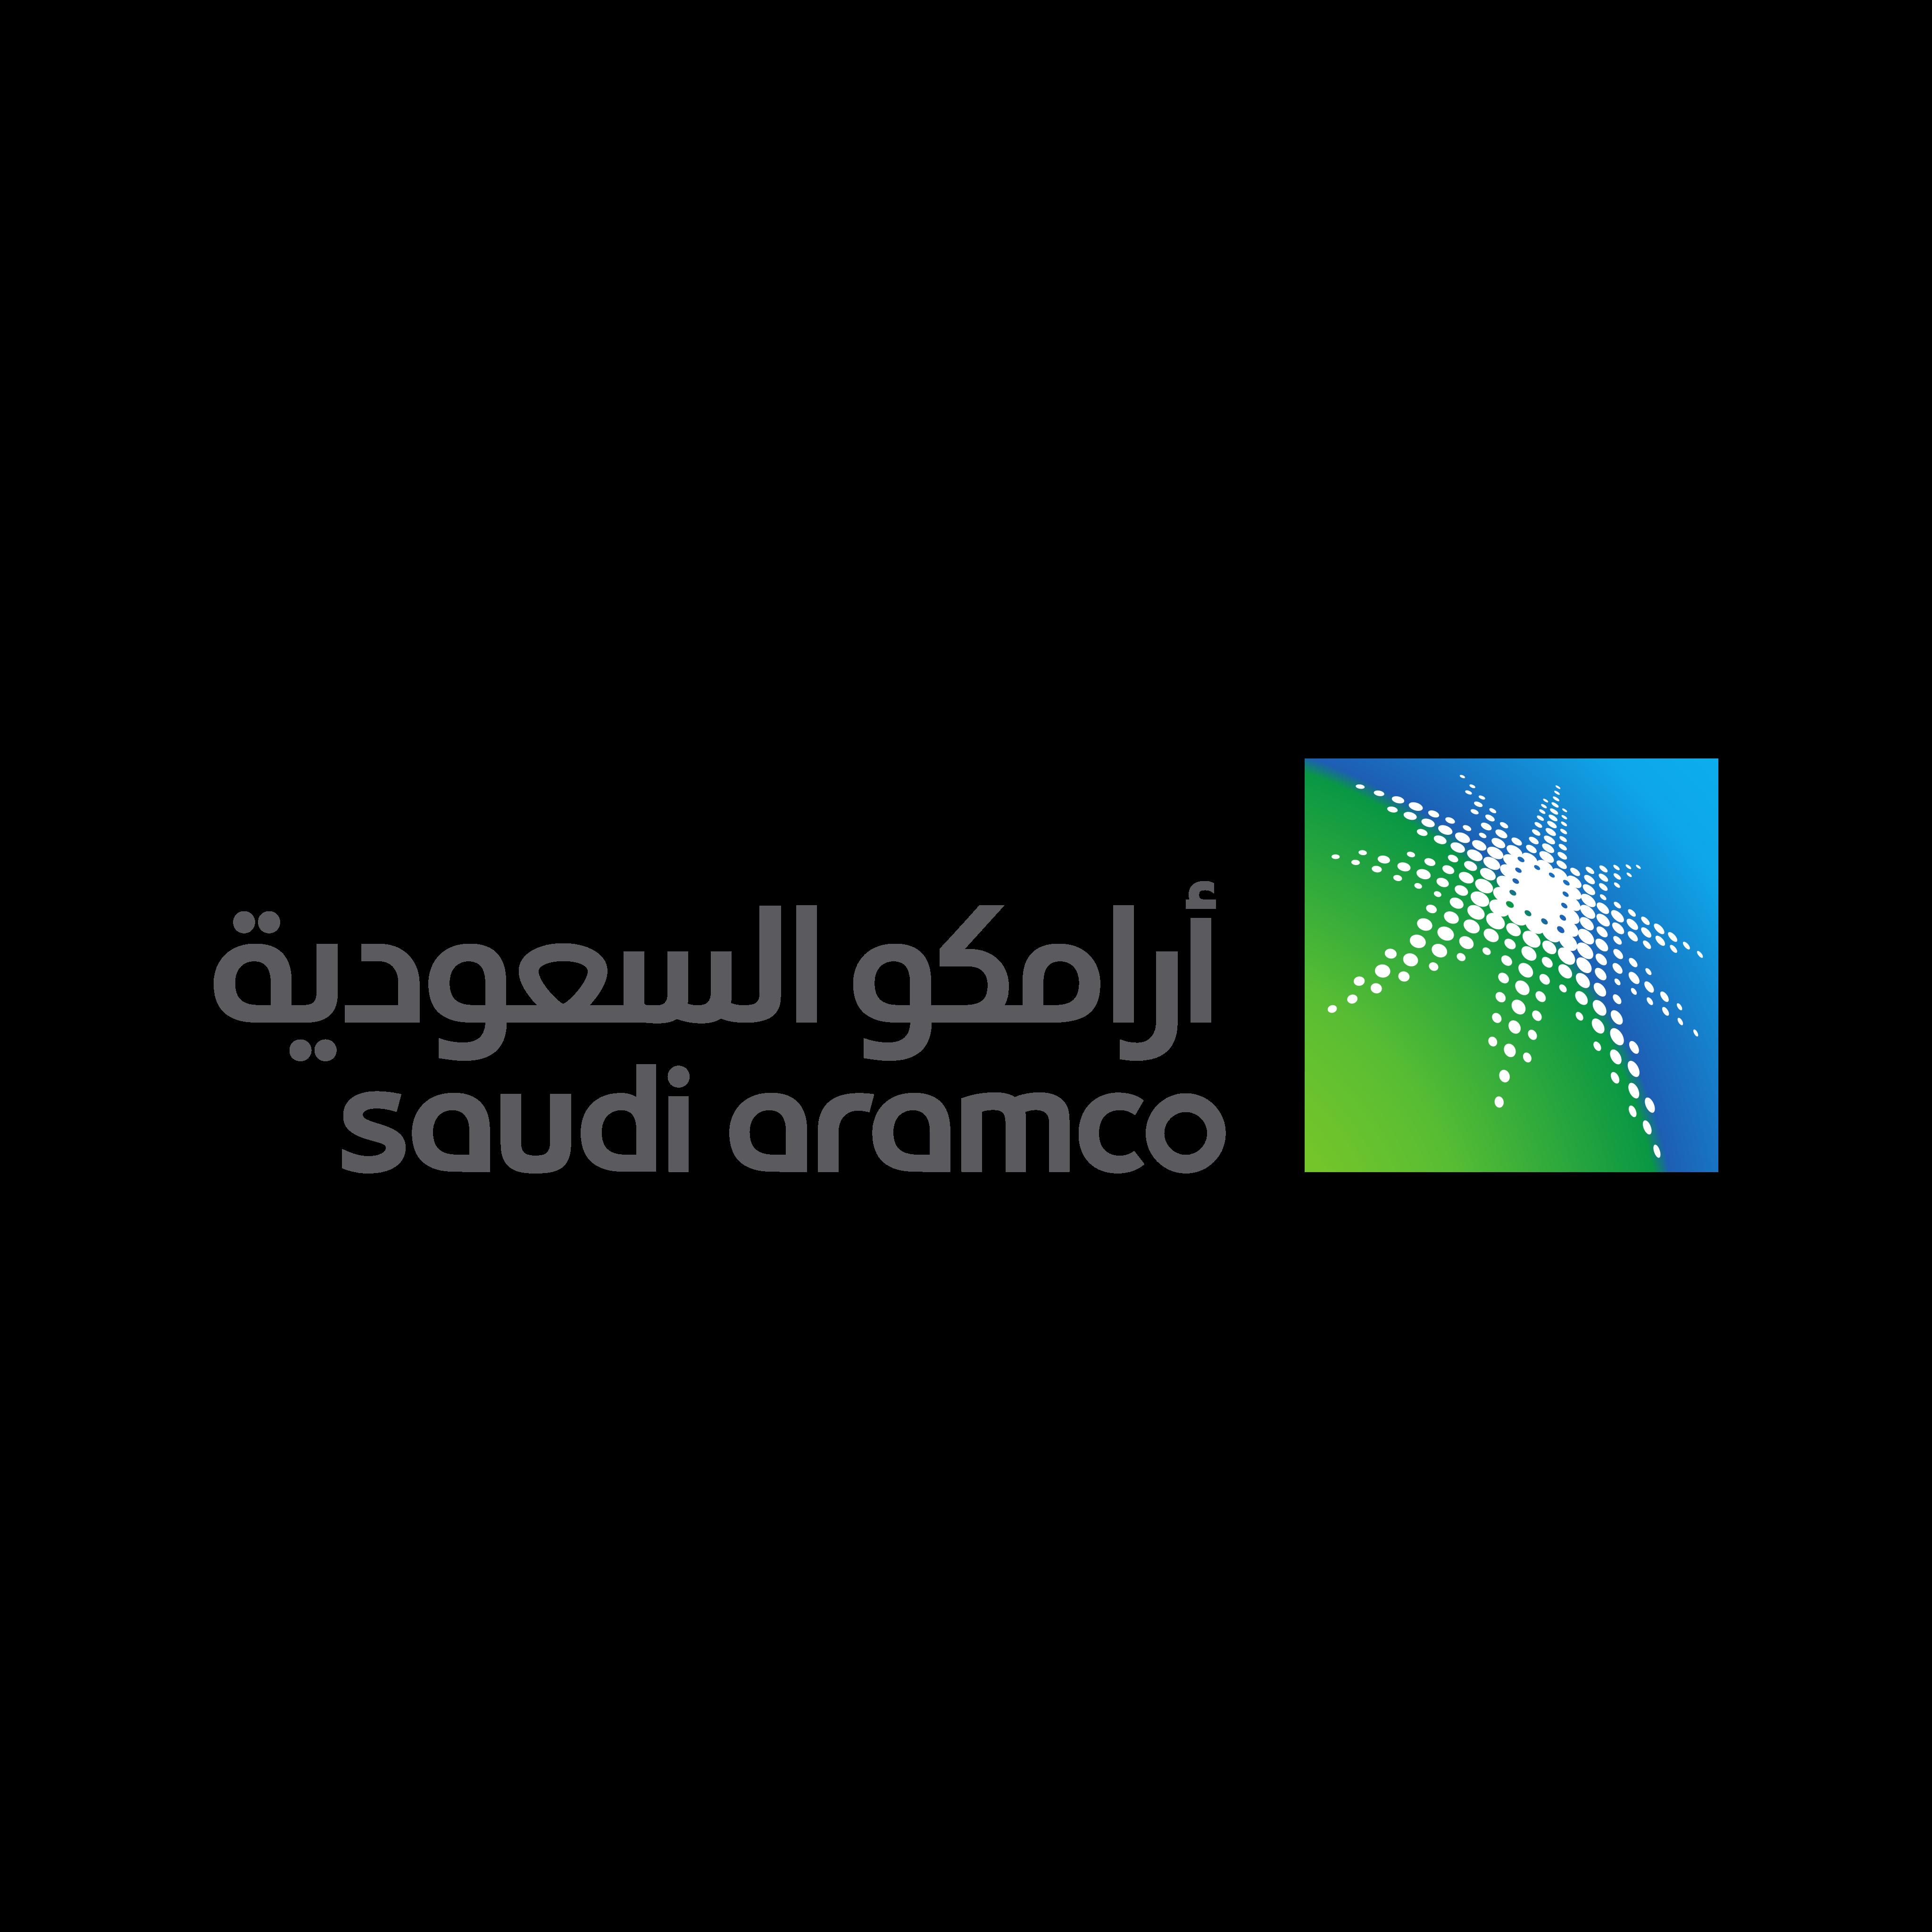 saudi aramco logo 0 - Saudi Aramco Logo